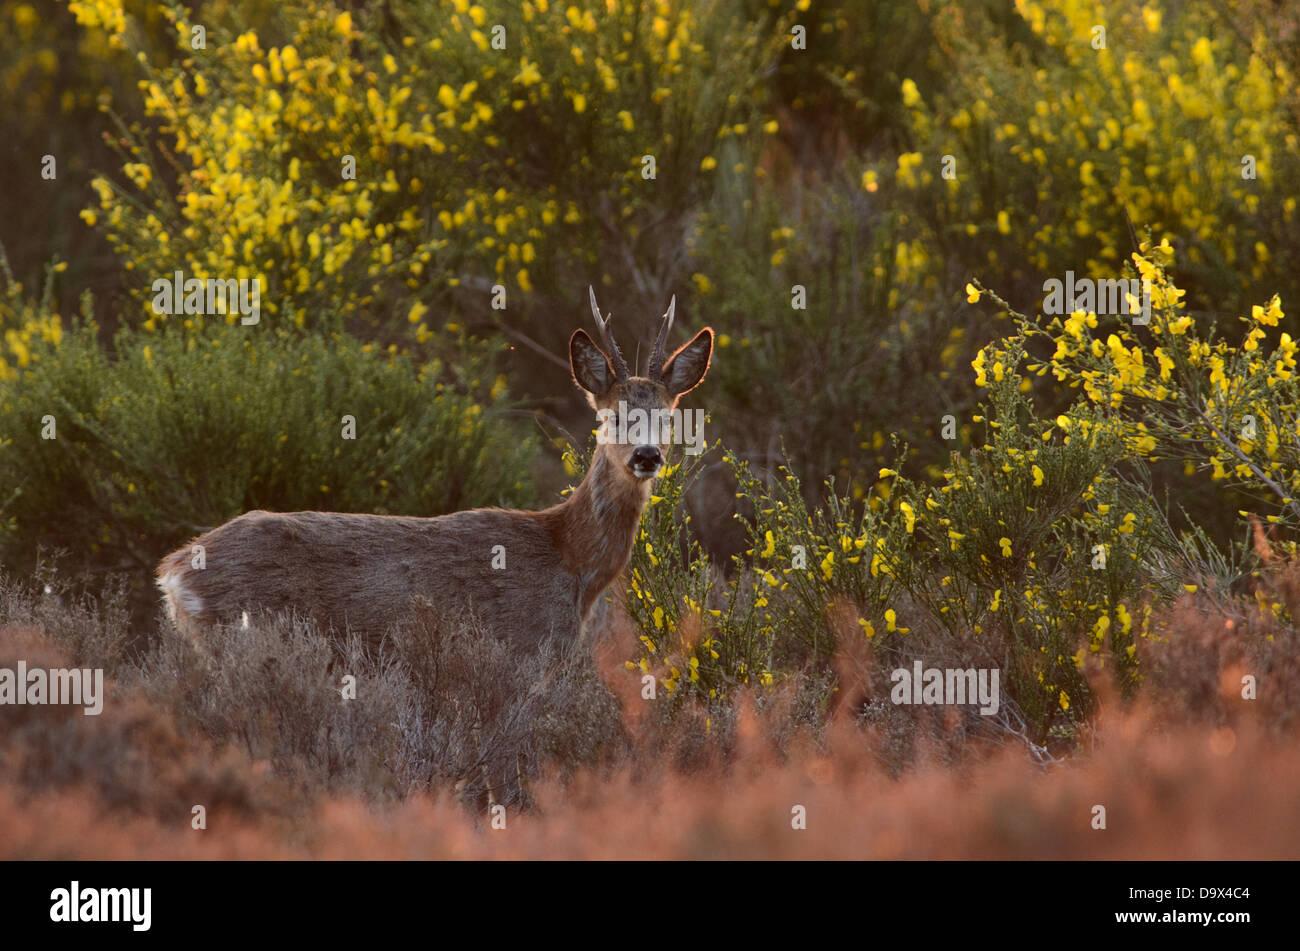 Male Roe Deer between the yellow flowers of Broom Stock Photo